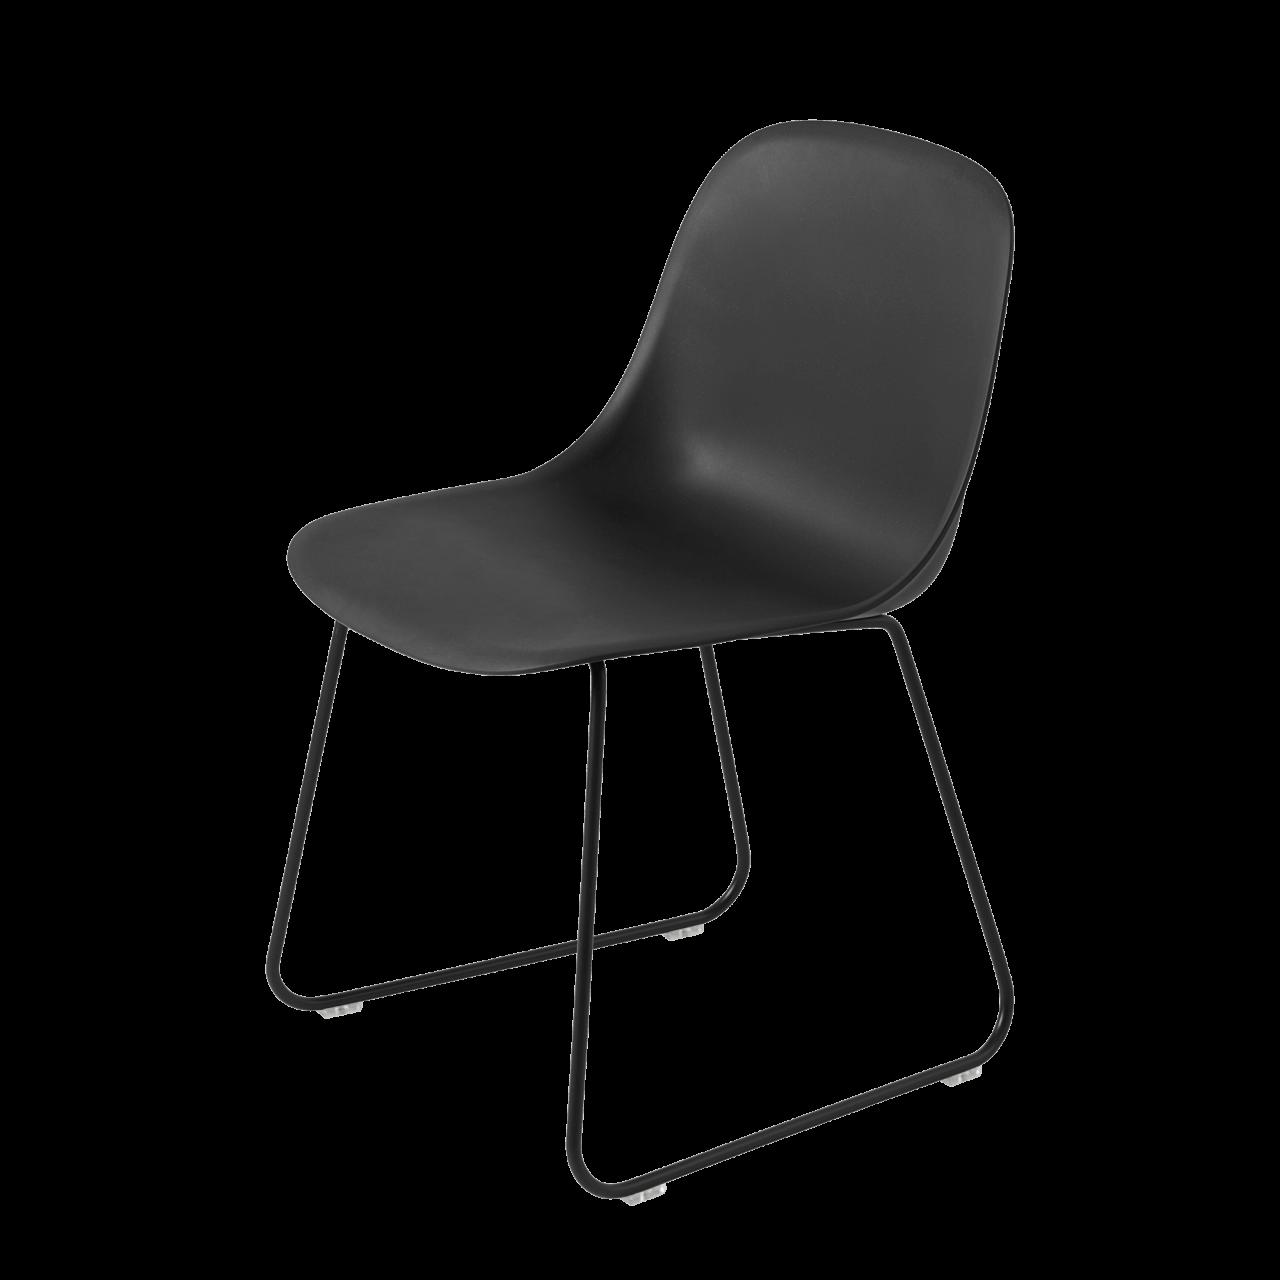 Fiber Stuhl Kufengestell